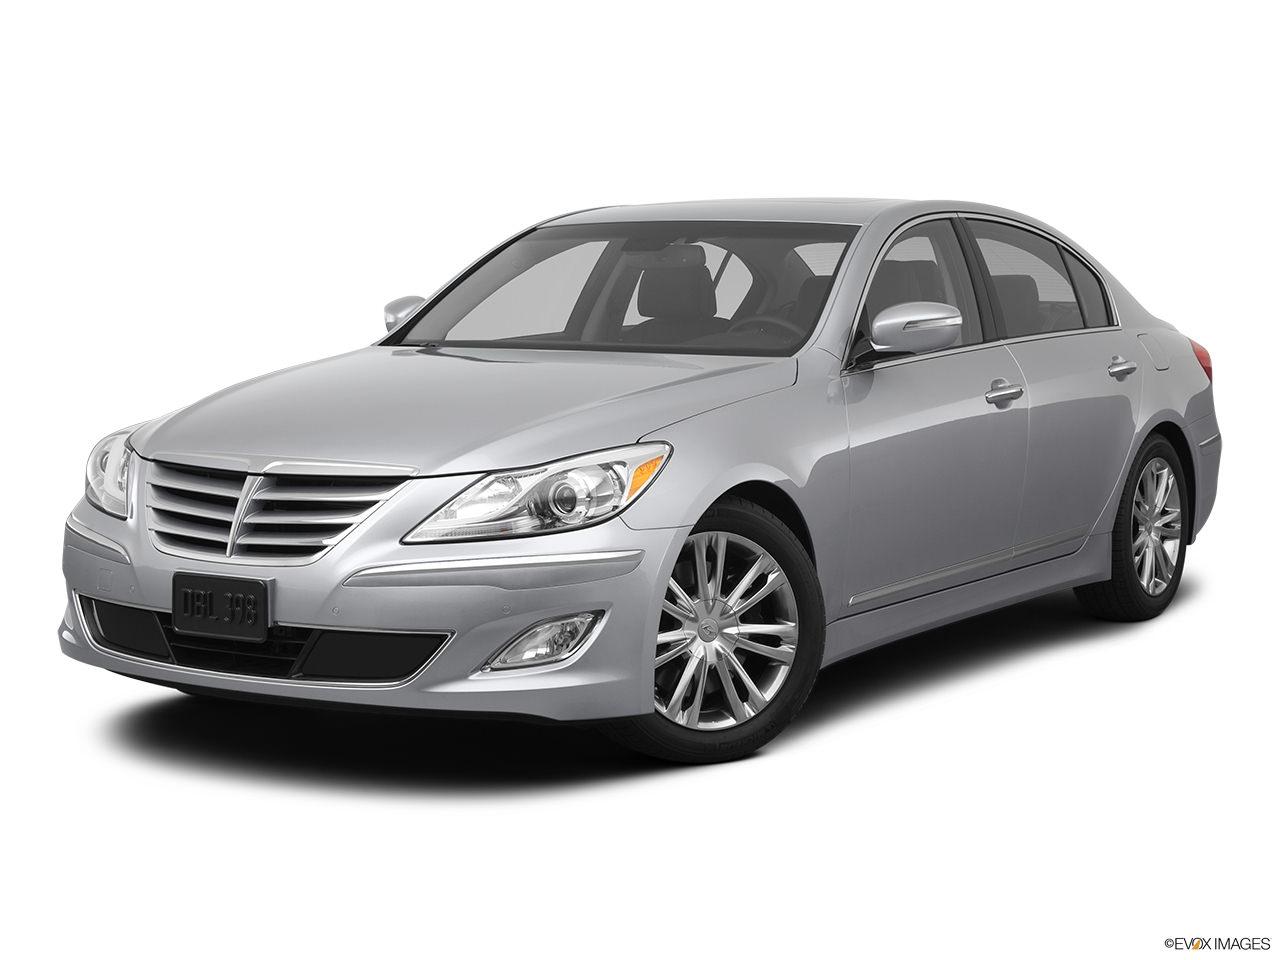 A Buyers Guide To The 2012 Hyundai Genesis Yourmechanic Advice 2003 Saturn Vue Black